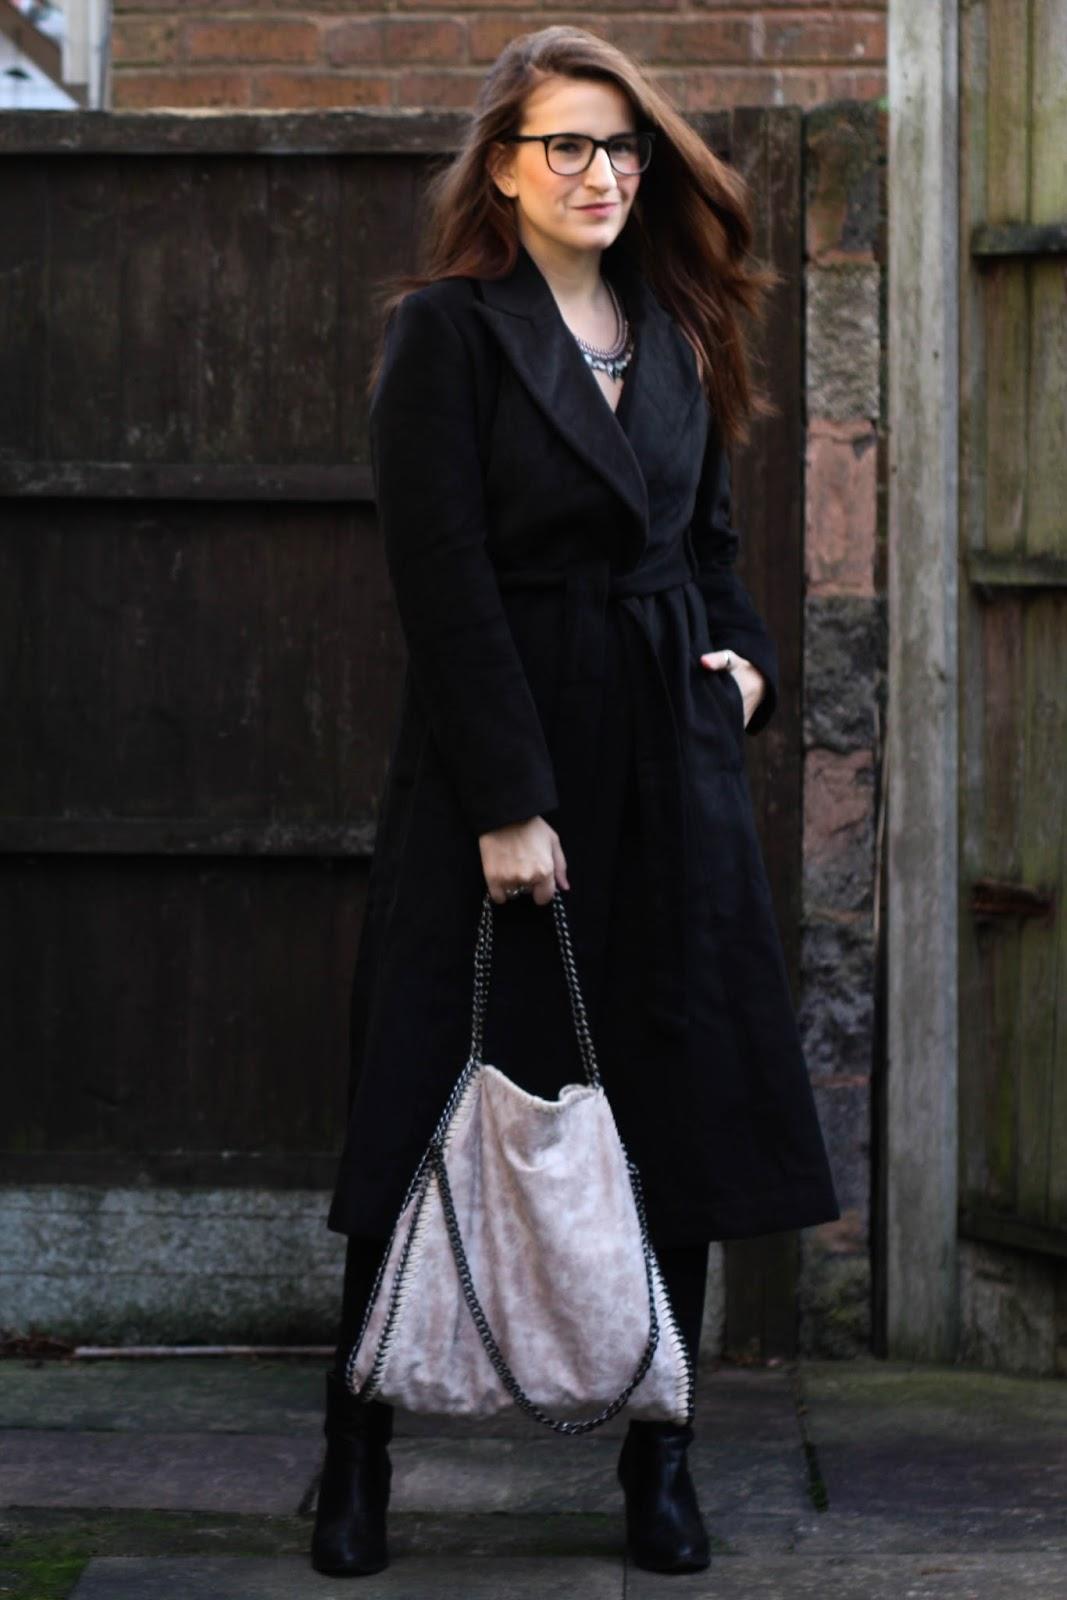 long black coat 0share mujjhep